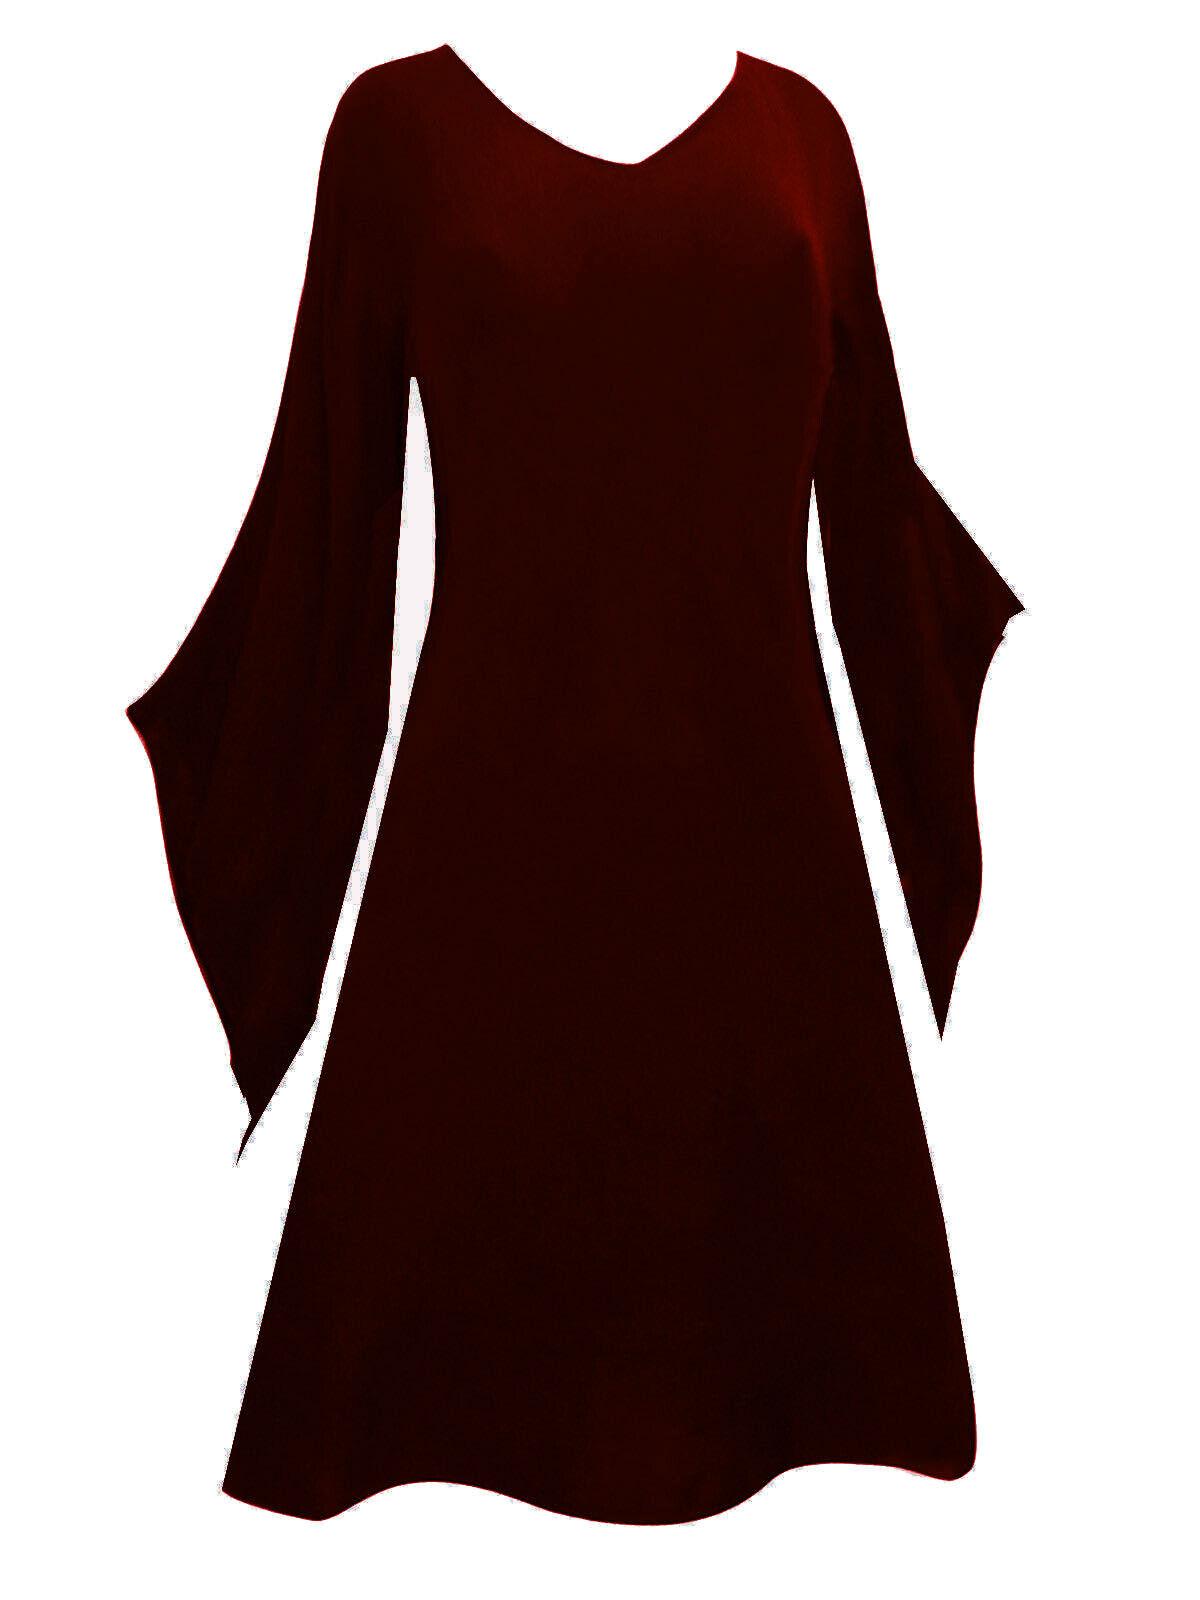 Mittelalter Zipfel Top Oberteil Mini Kleid Rubin red Übergröße 44 46 48 50 52 54